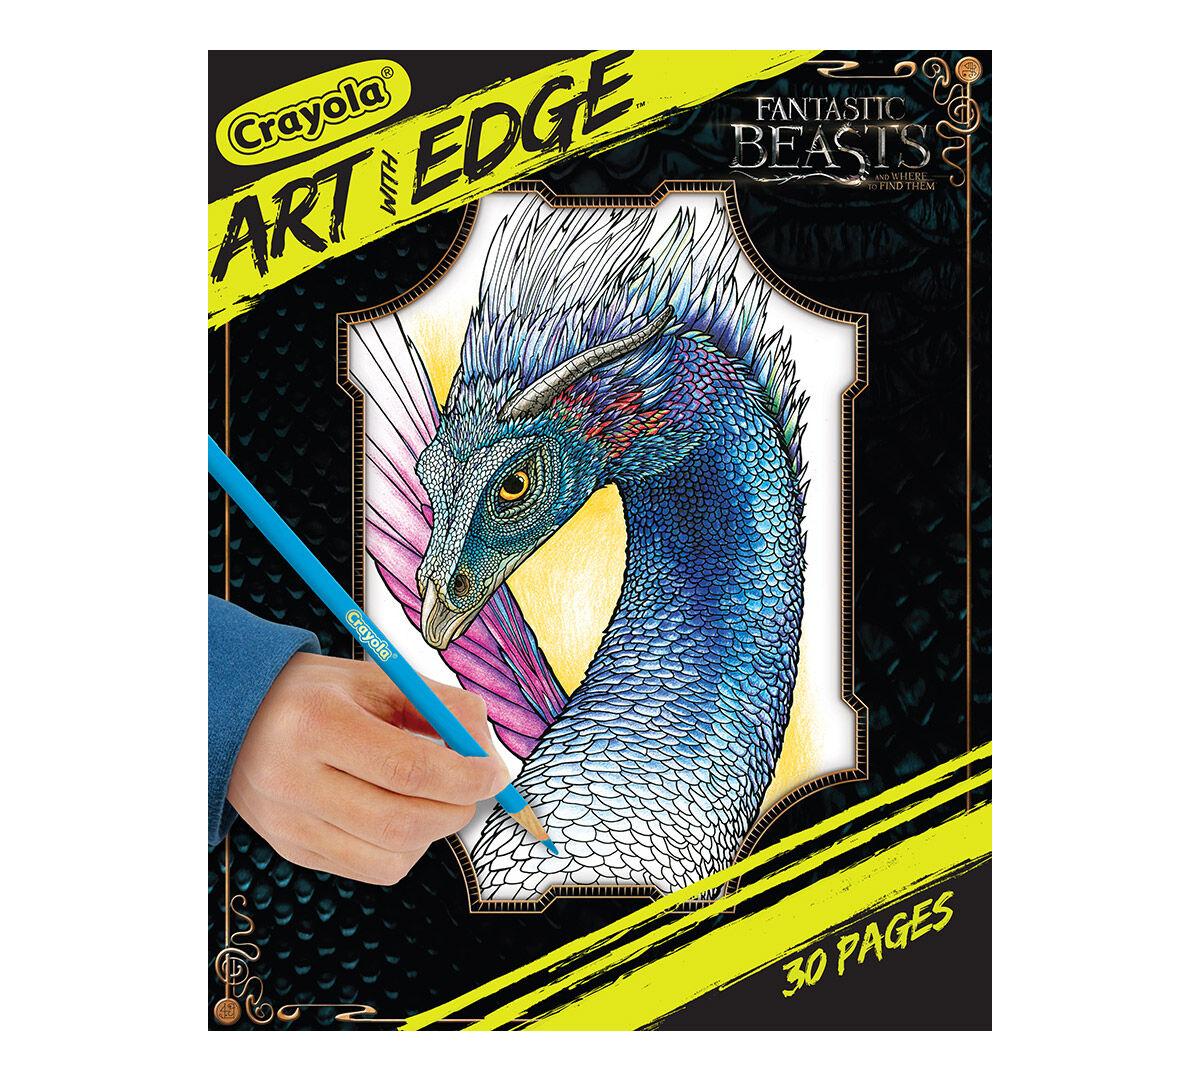 crayola art with edge fantastic beasts harry potter story 30